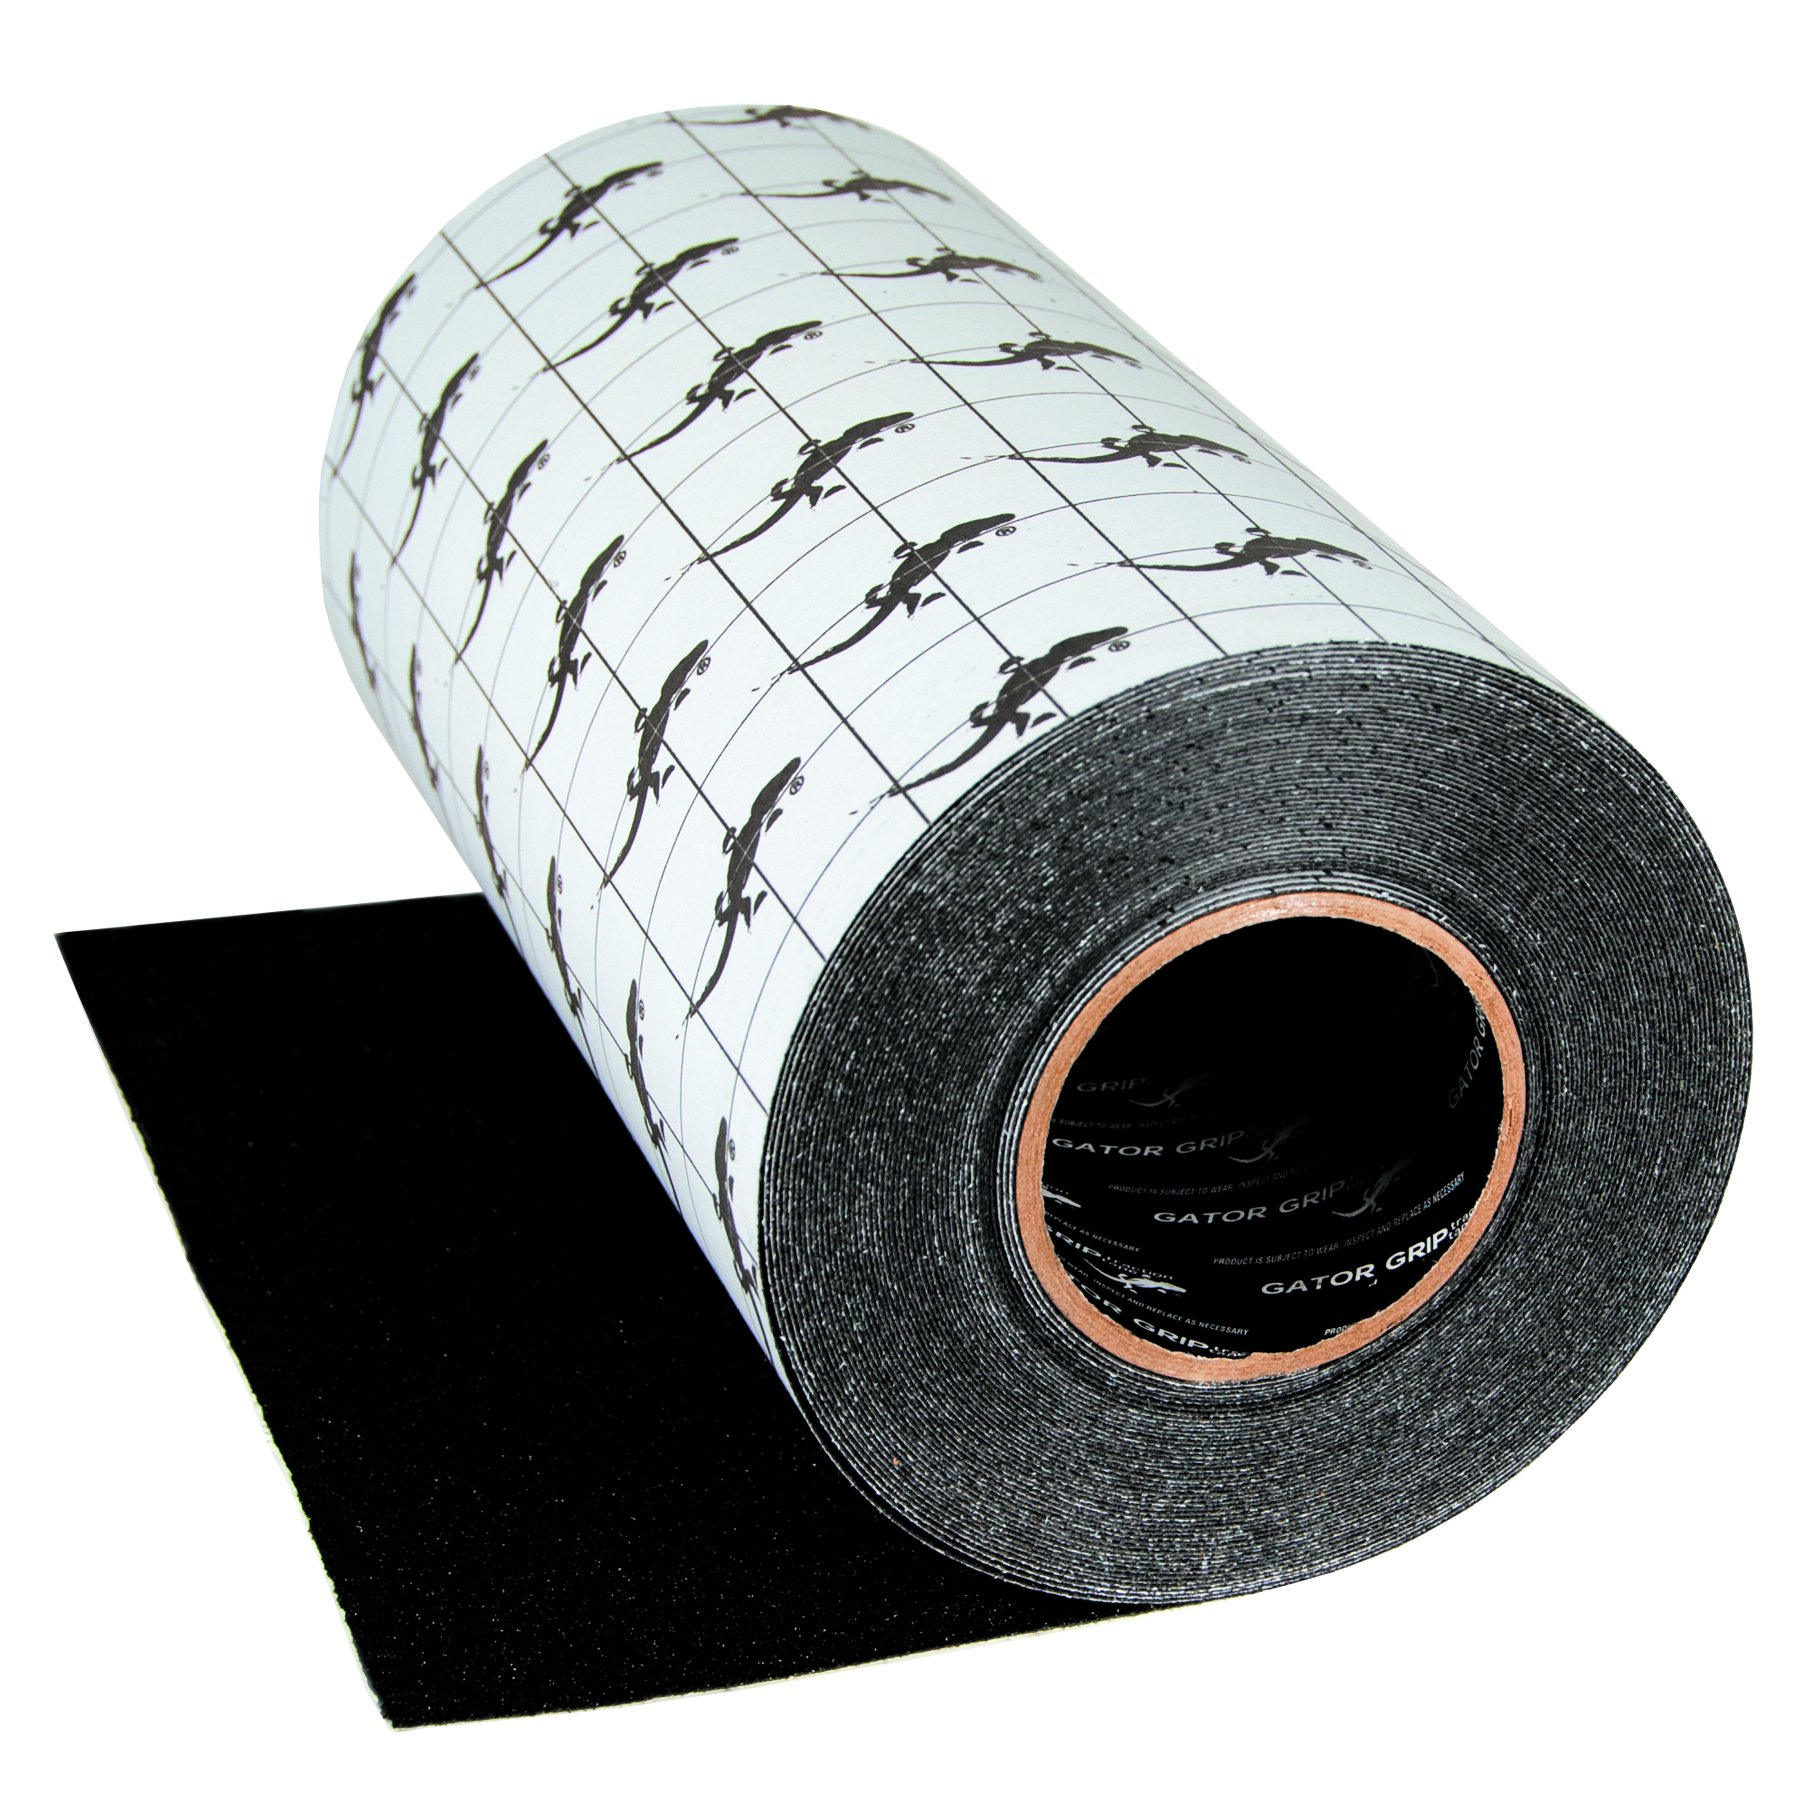 Gator Grip  : SG3112B Premium Grade High Traction Non Slip 60 Grit Indoor Outdoor Anti-Slip Tape, 12 Inch x 60 Foot, Black